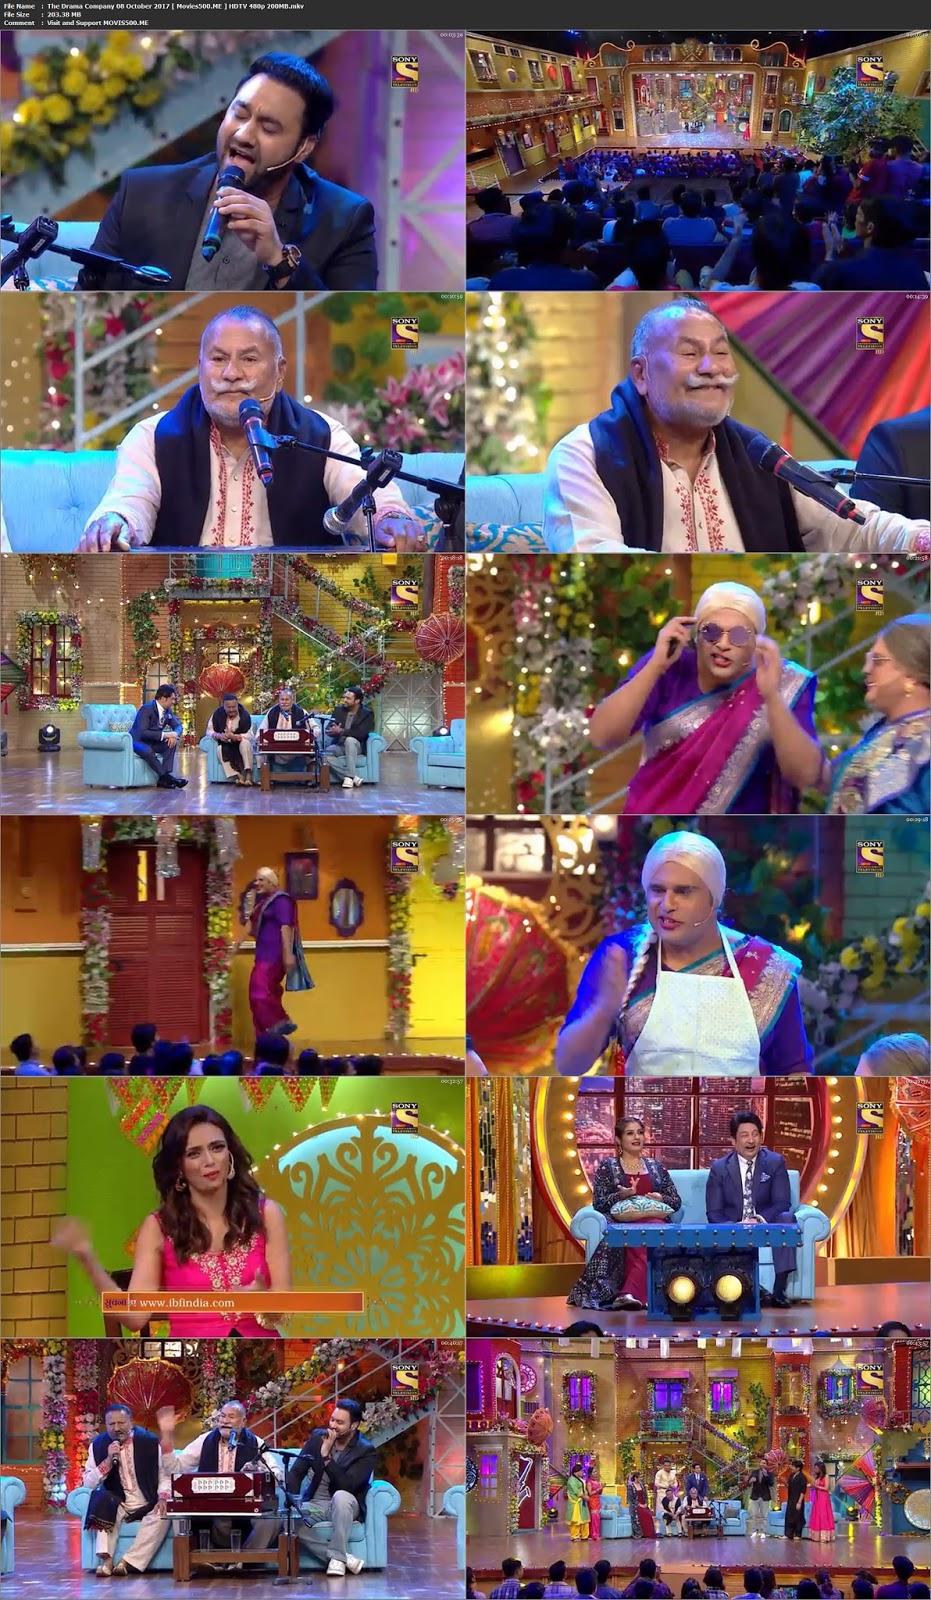 The Drama Company 08 October 2017 Full Show 203MB HDTV 480p at 9966132.com